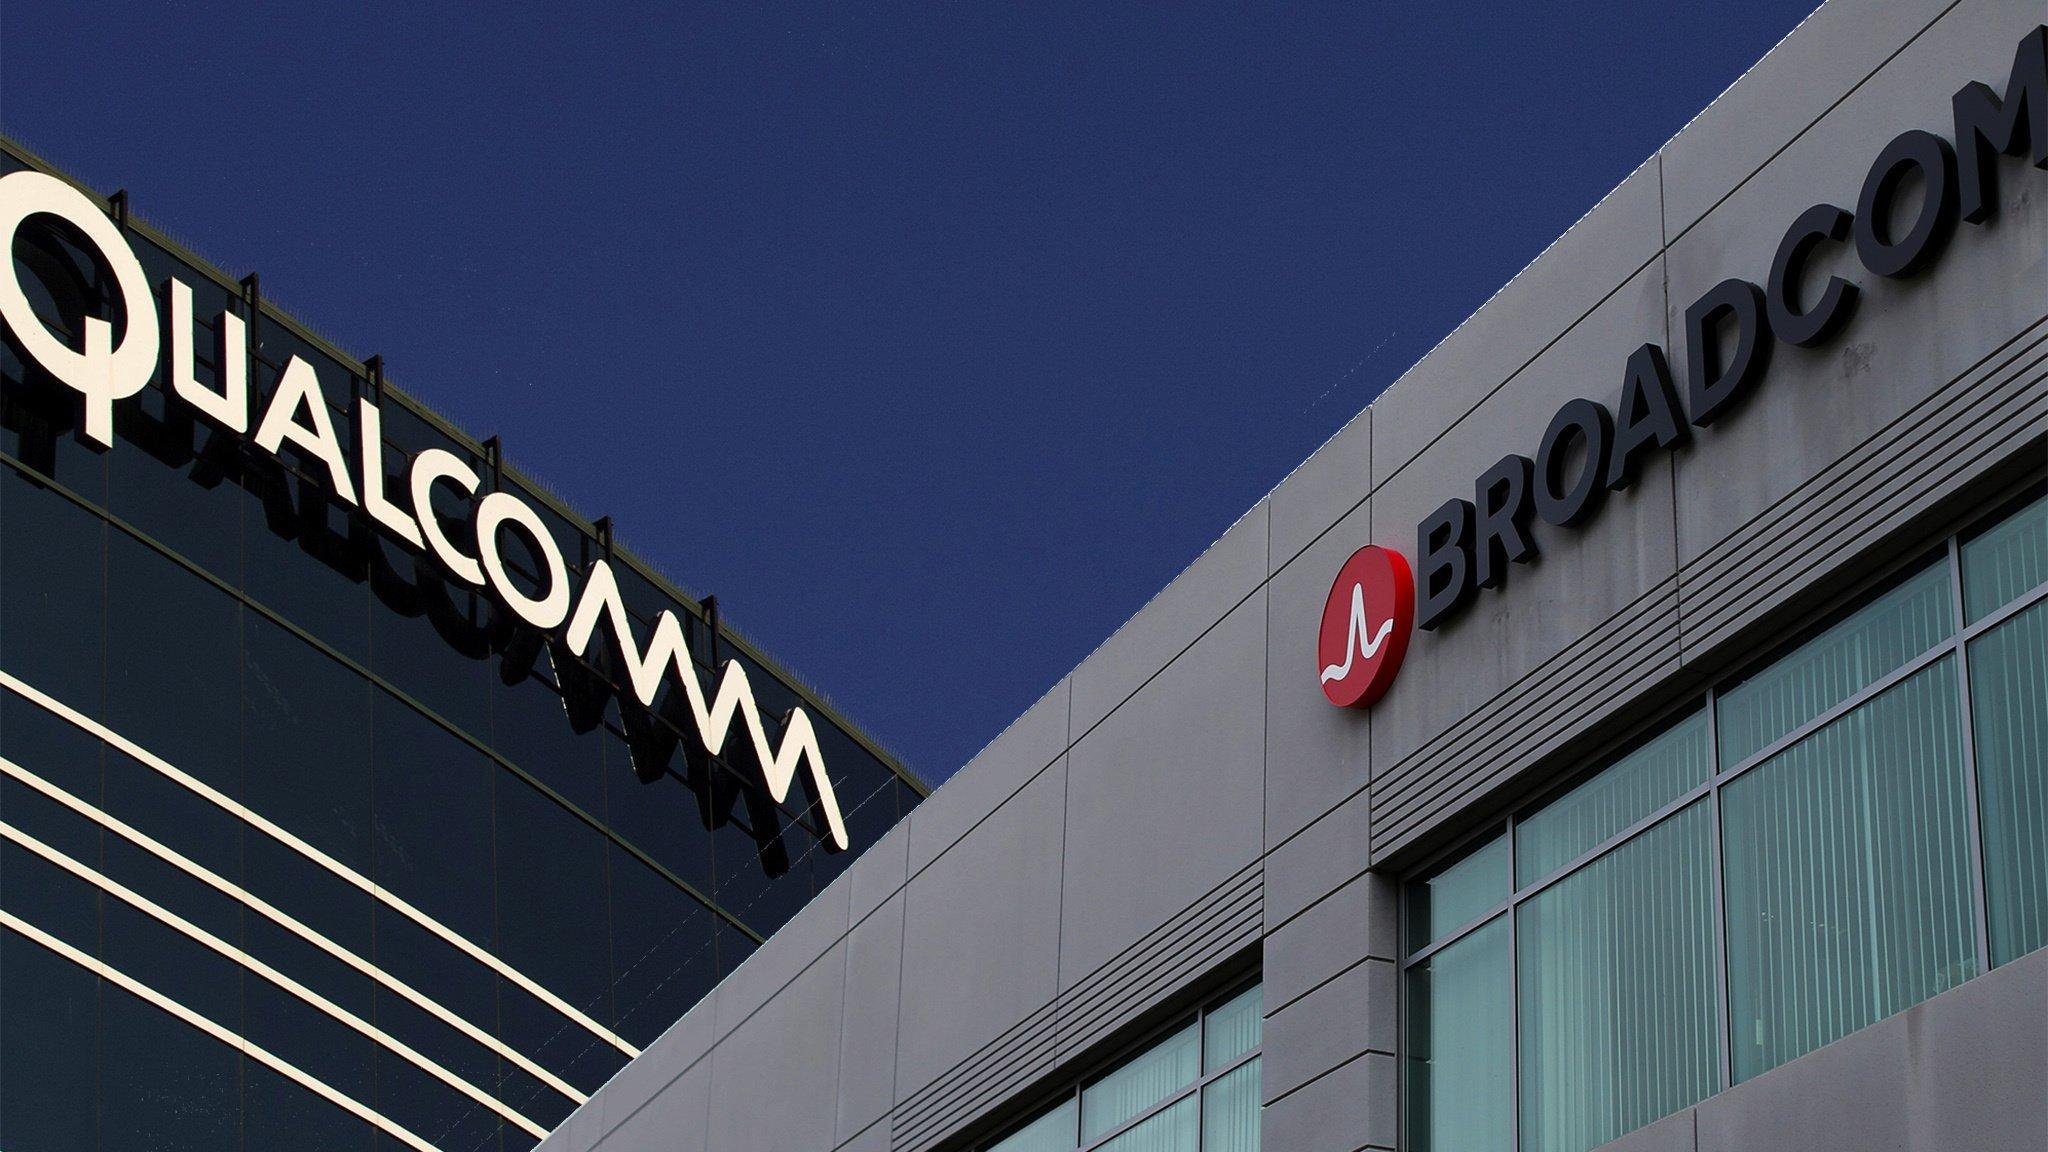 Broadcom seeks to oust Qualcomm board in hostile bid